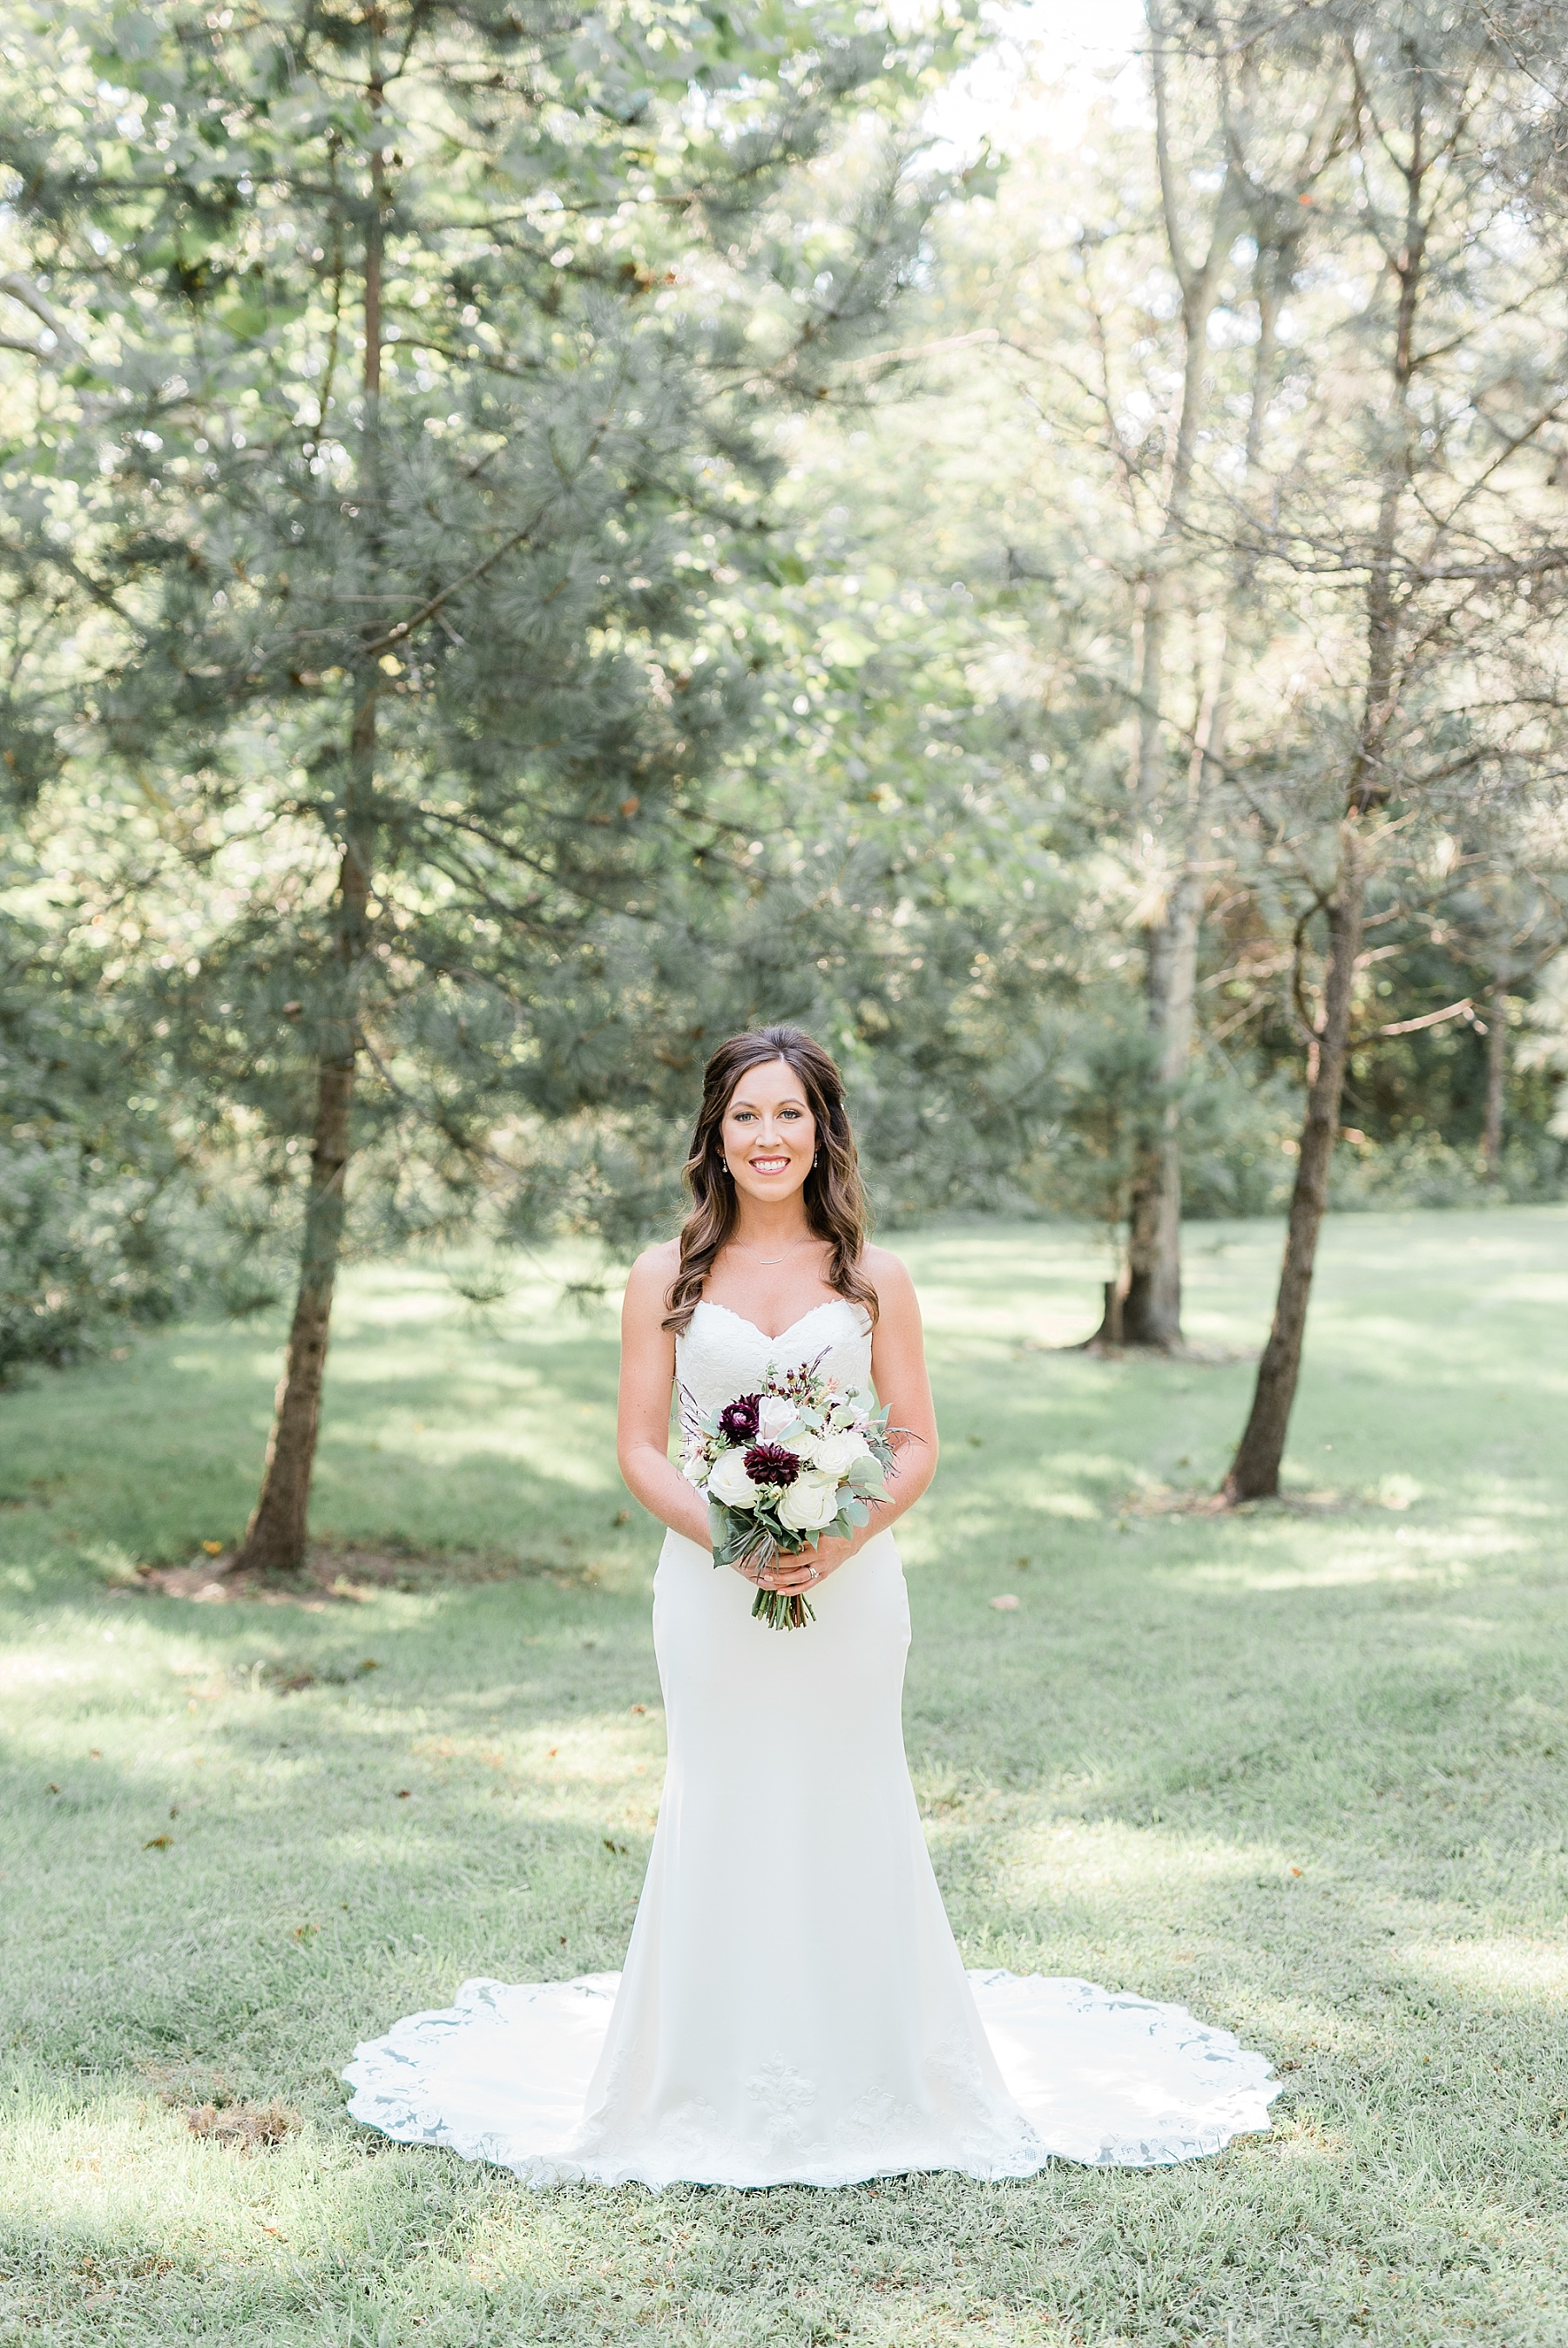 Romantic Summer Sunset Wedding Ceremony at Little Piney Lodge St. Louis Missouri by Kelsi Kliethermes Photography Fine Art Photographer_0049.jpg